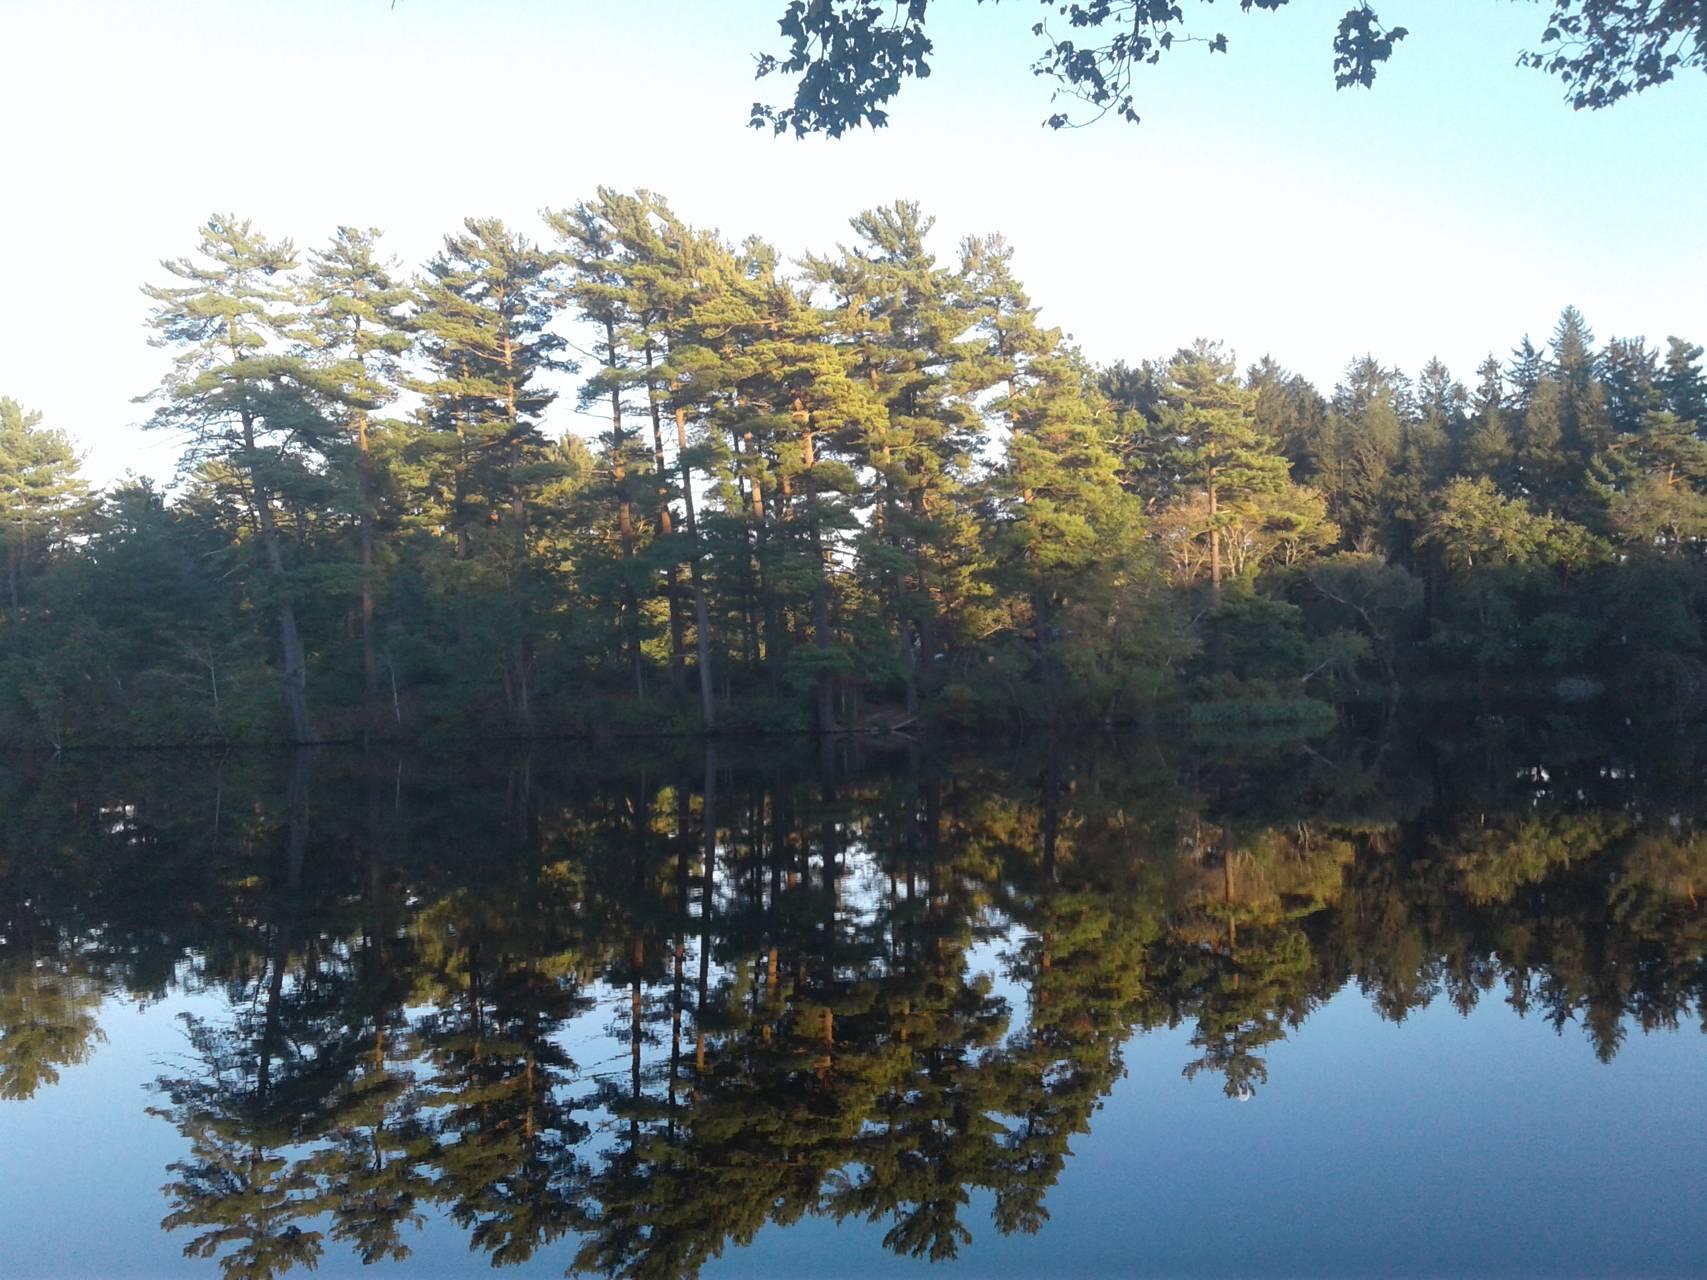 Lake of mystery